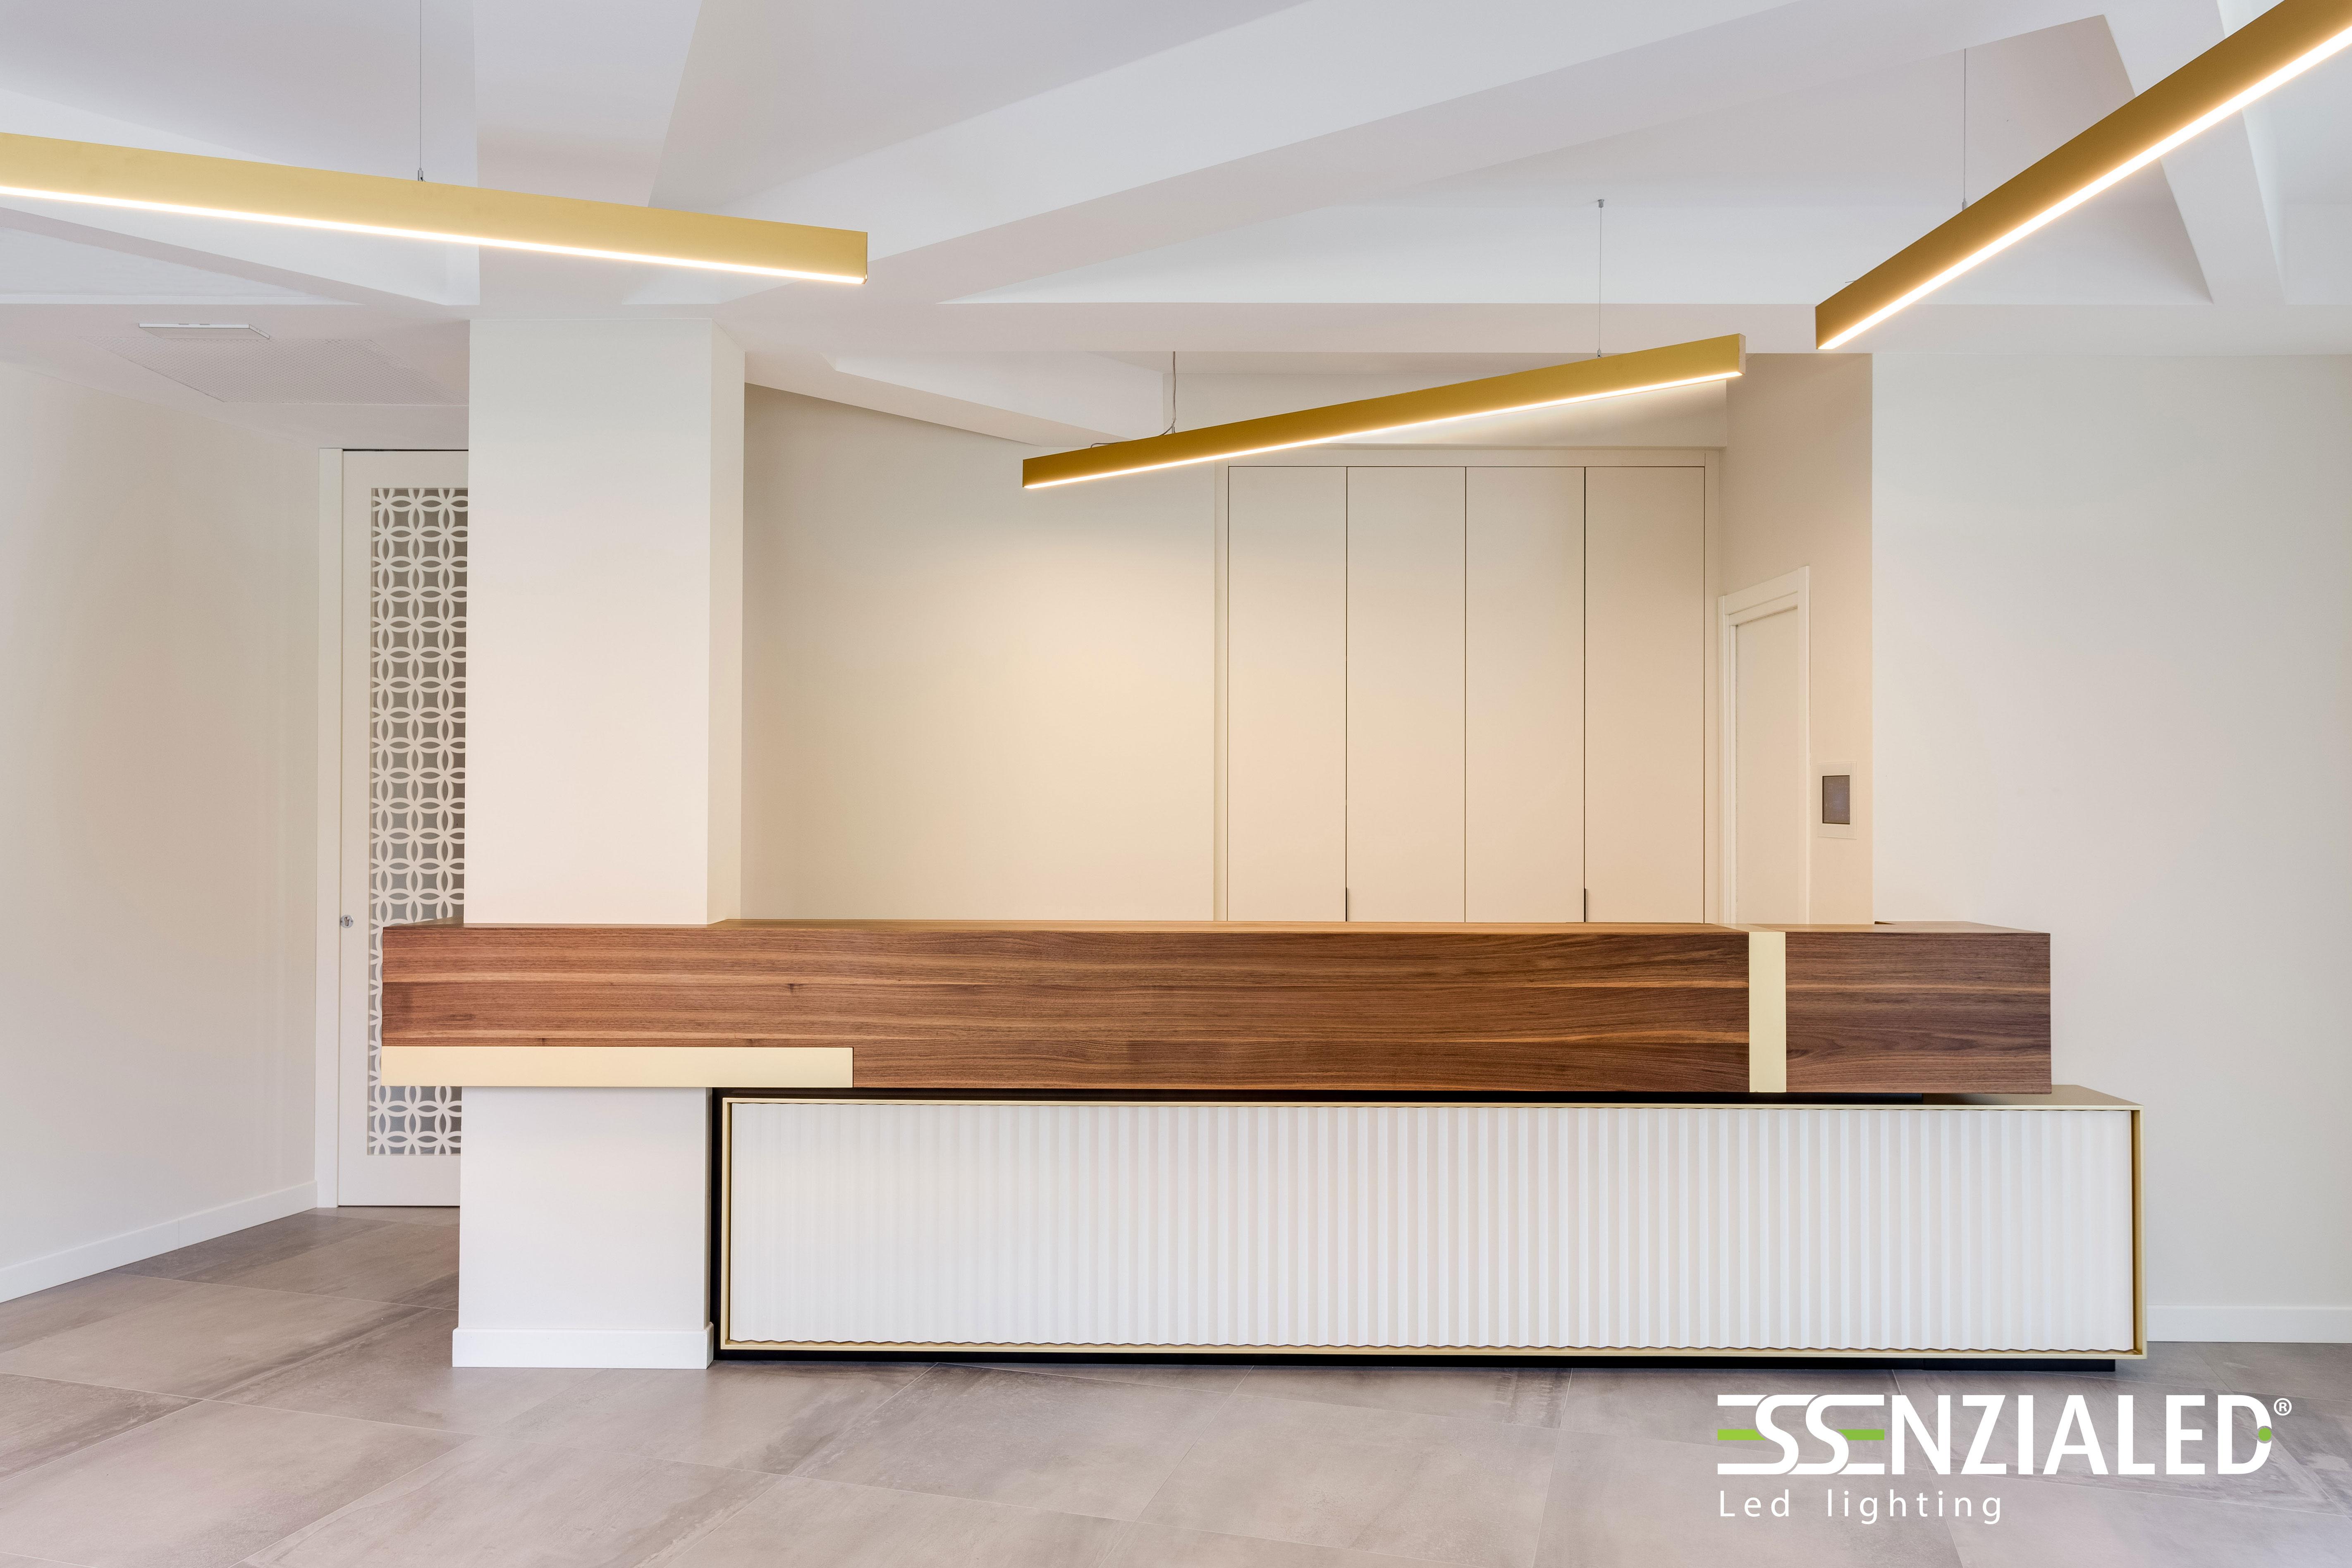 Illuminazione reception hotel lampade a sospensione essenzialed